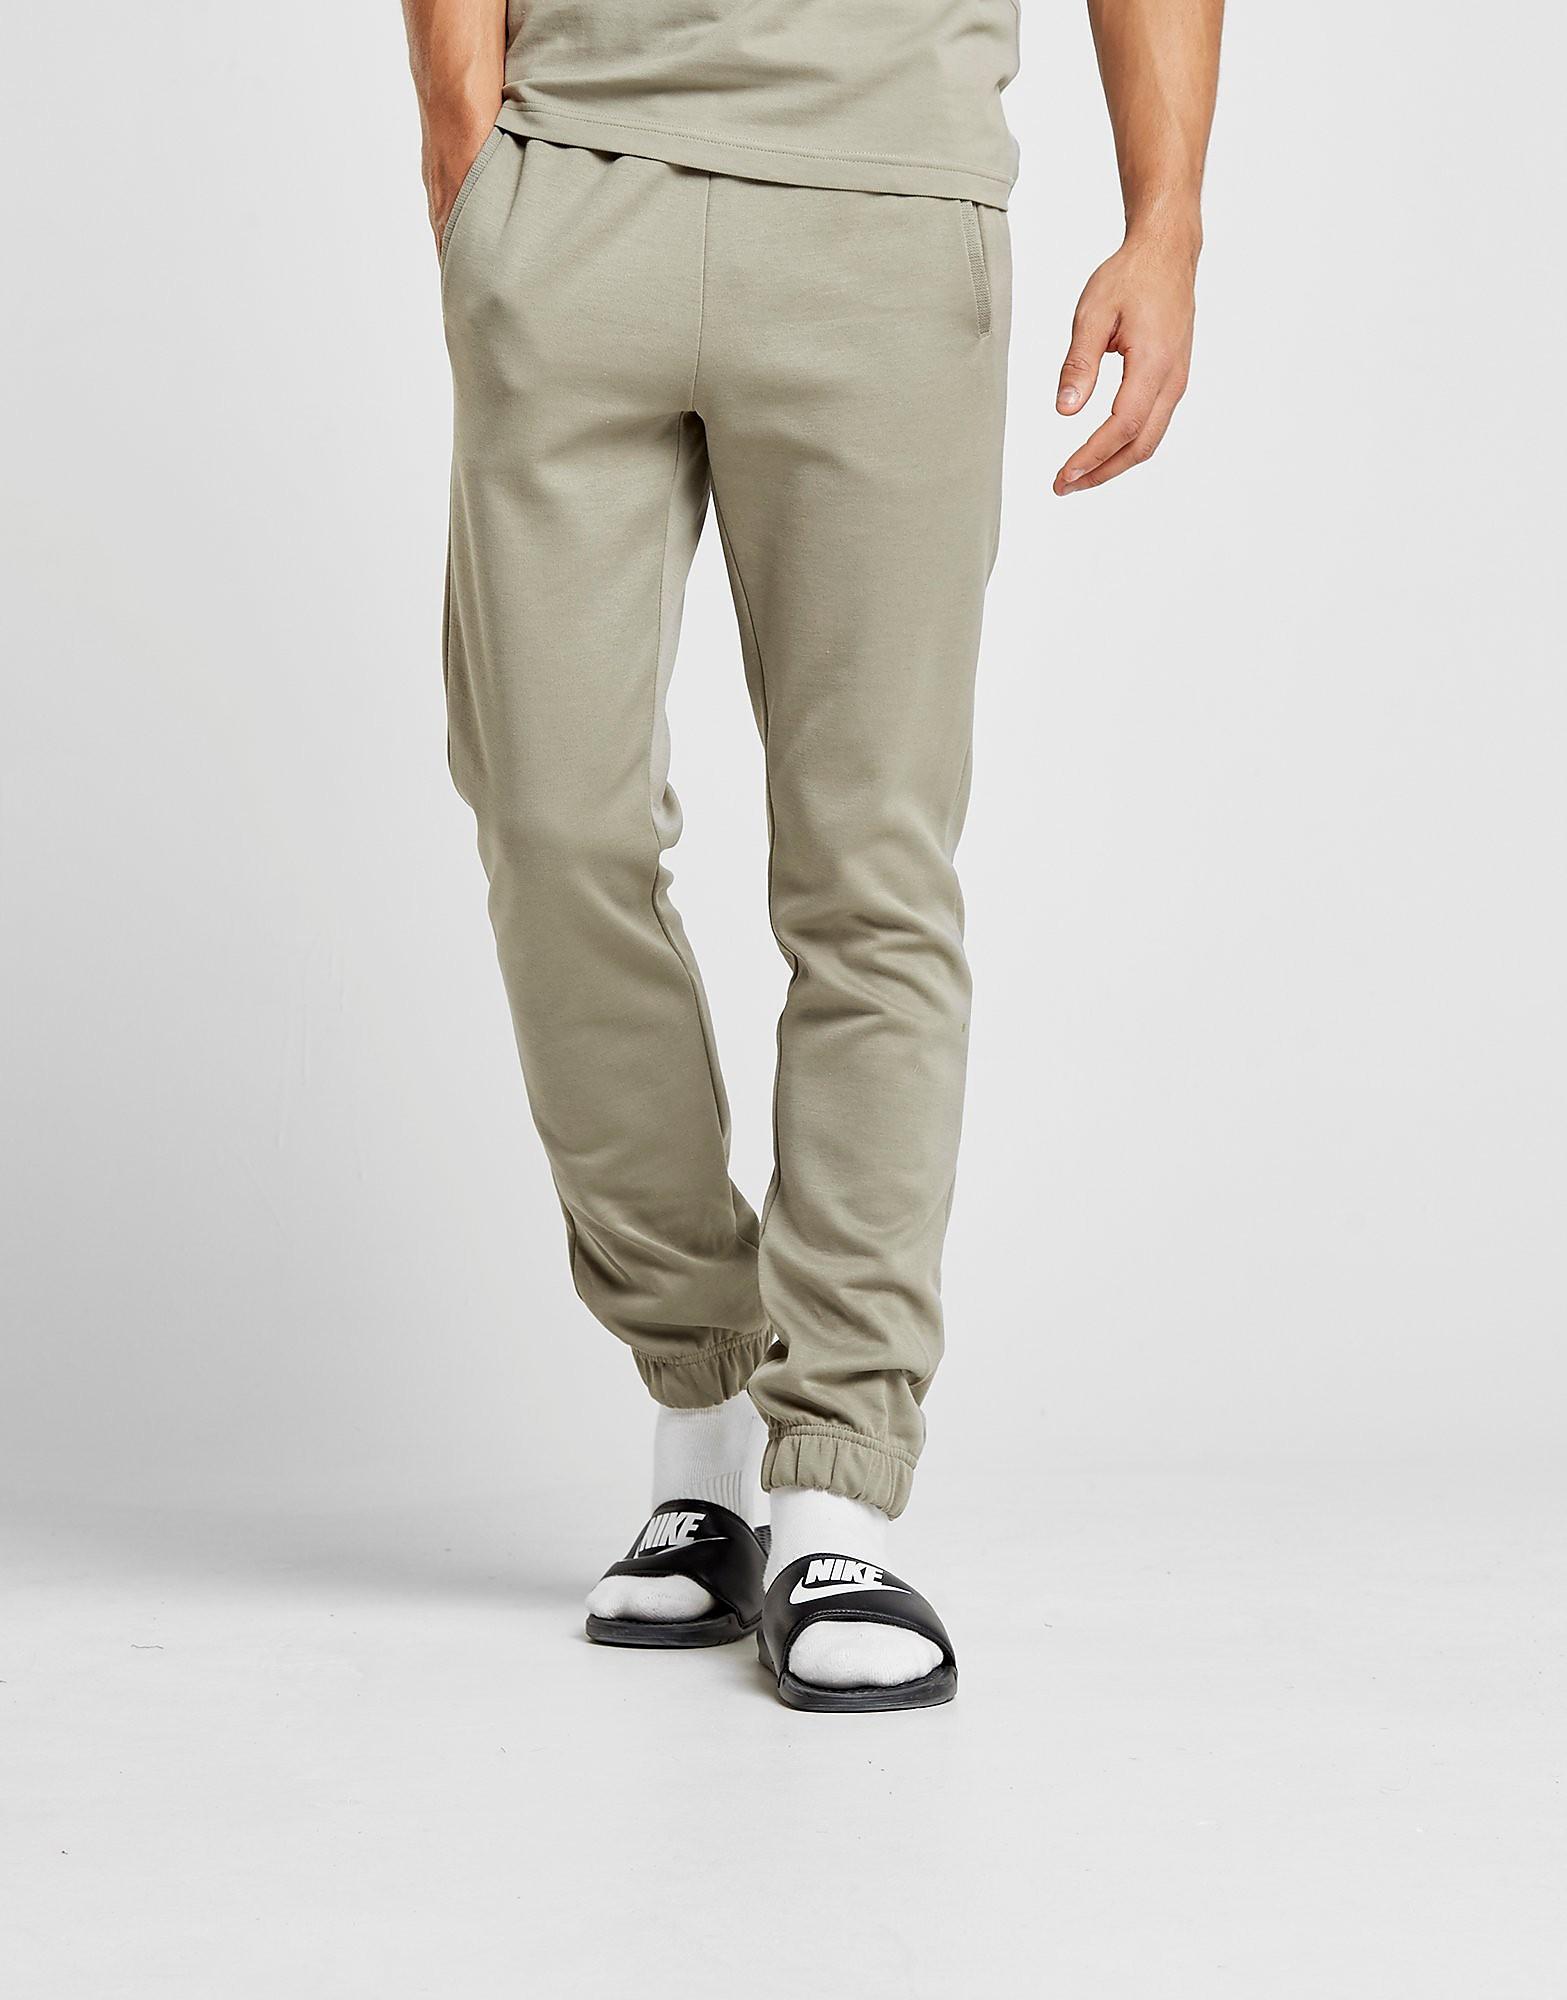 BOSS Green Hadiko Pants Heren - Khaki - Heren